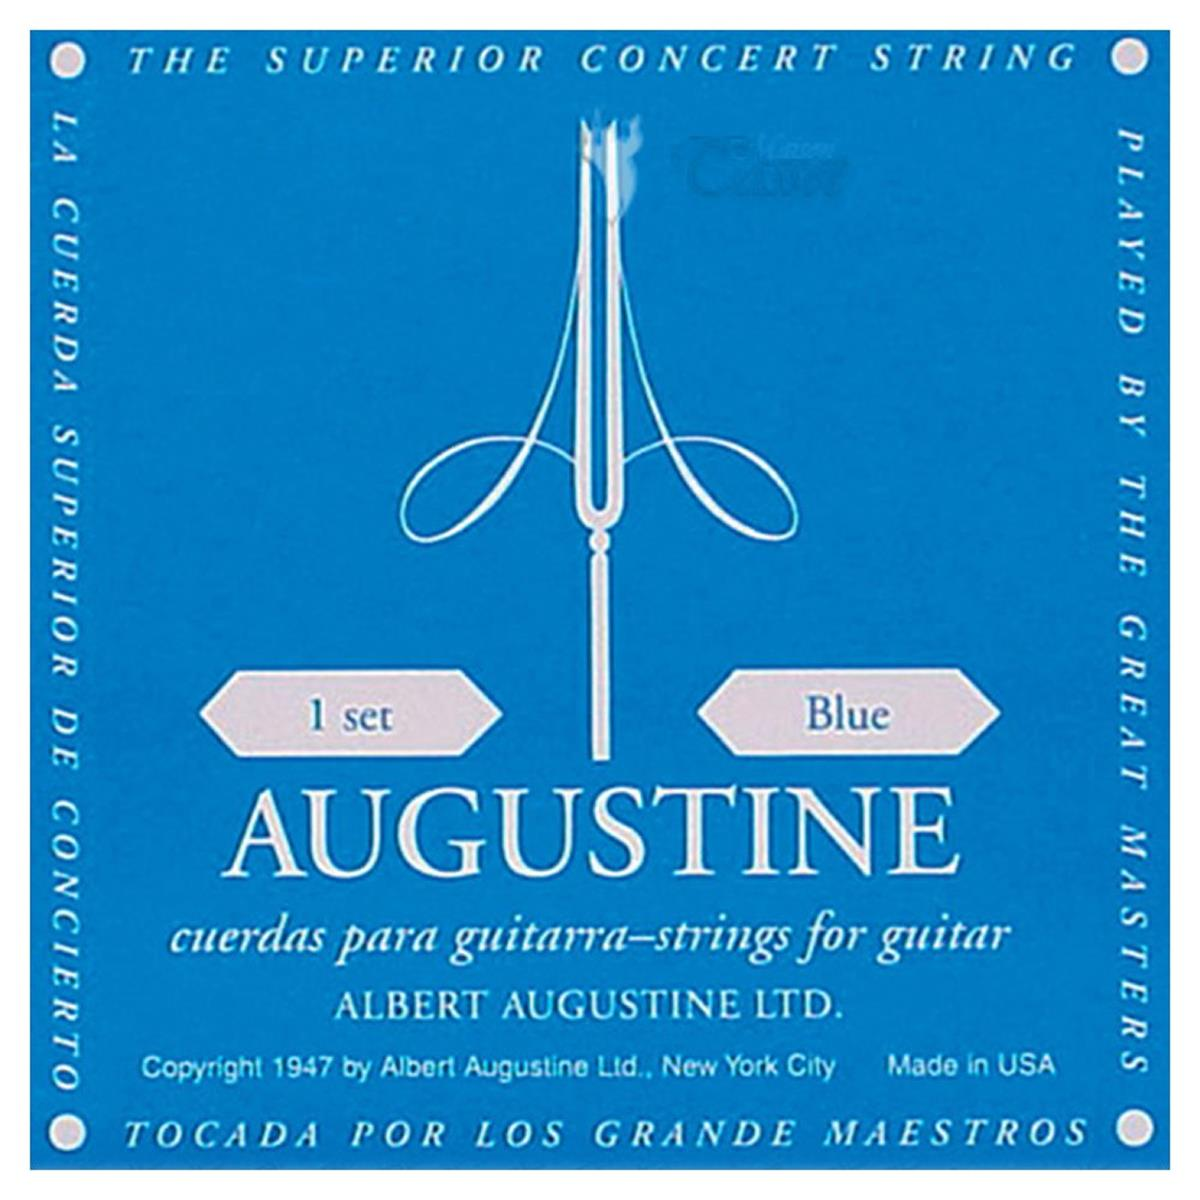 AUGUSTINE SET CORDE CHITARRA CLASSICA BLUE LABEL